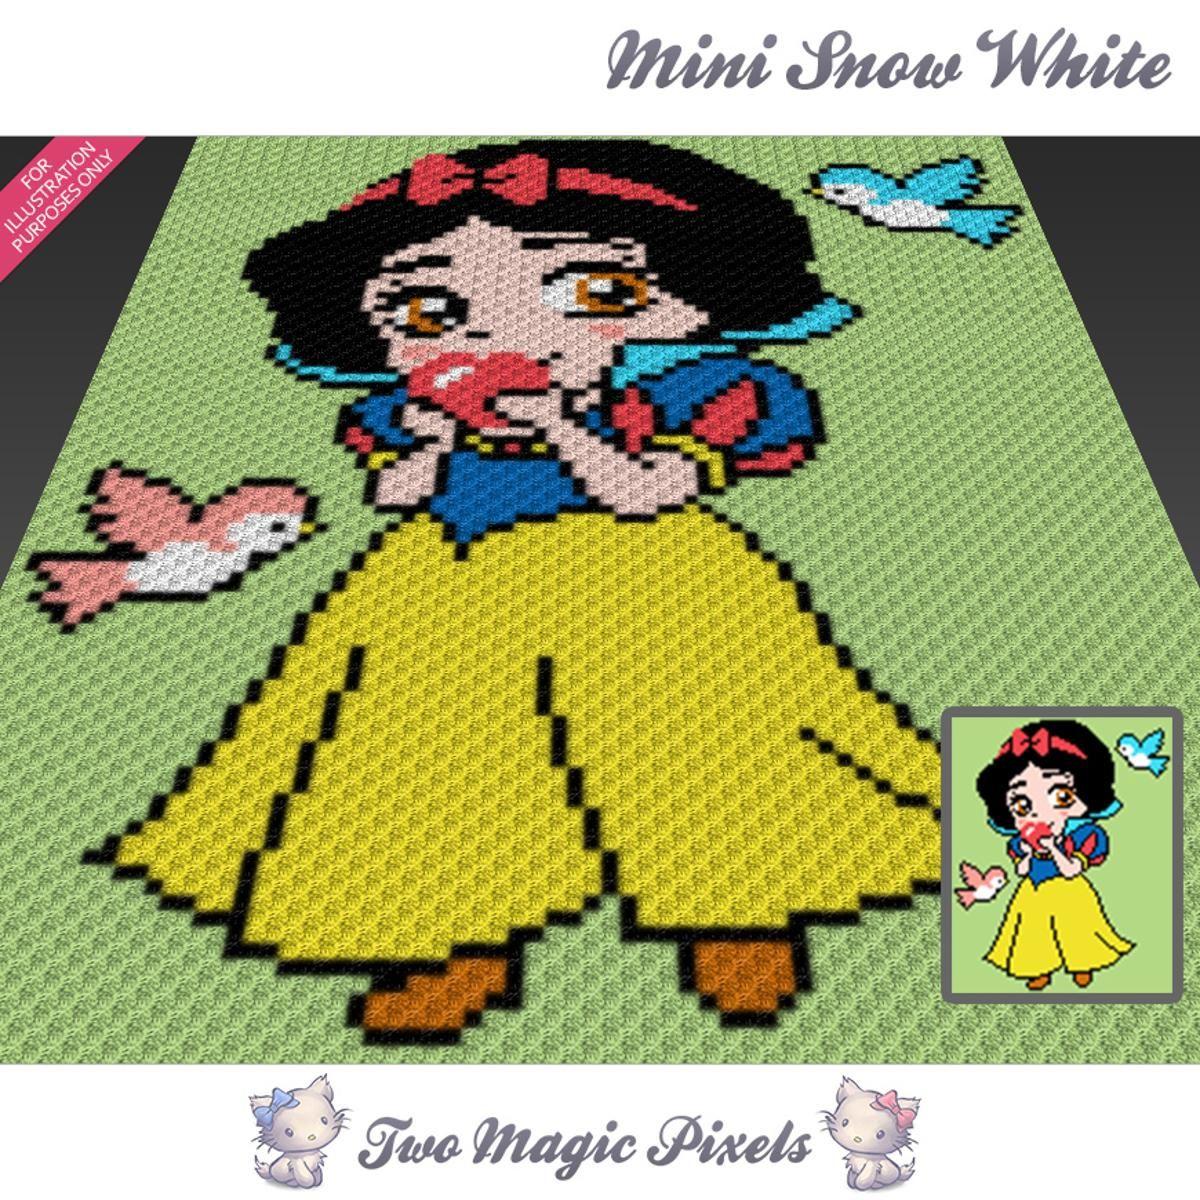 Mini Snow White C2C Crochet Graph | Mantas de bebes, Mantas tejidas ...